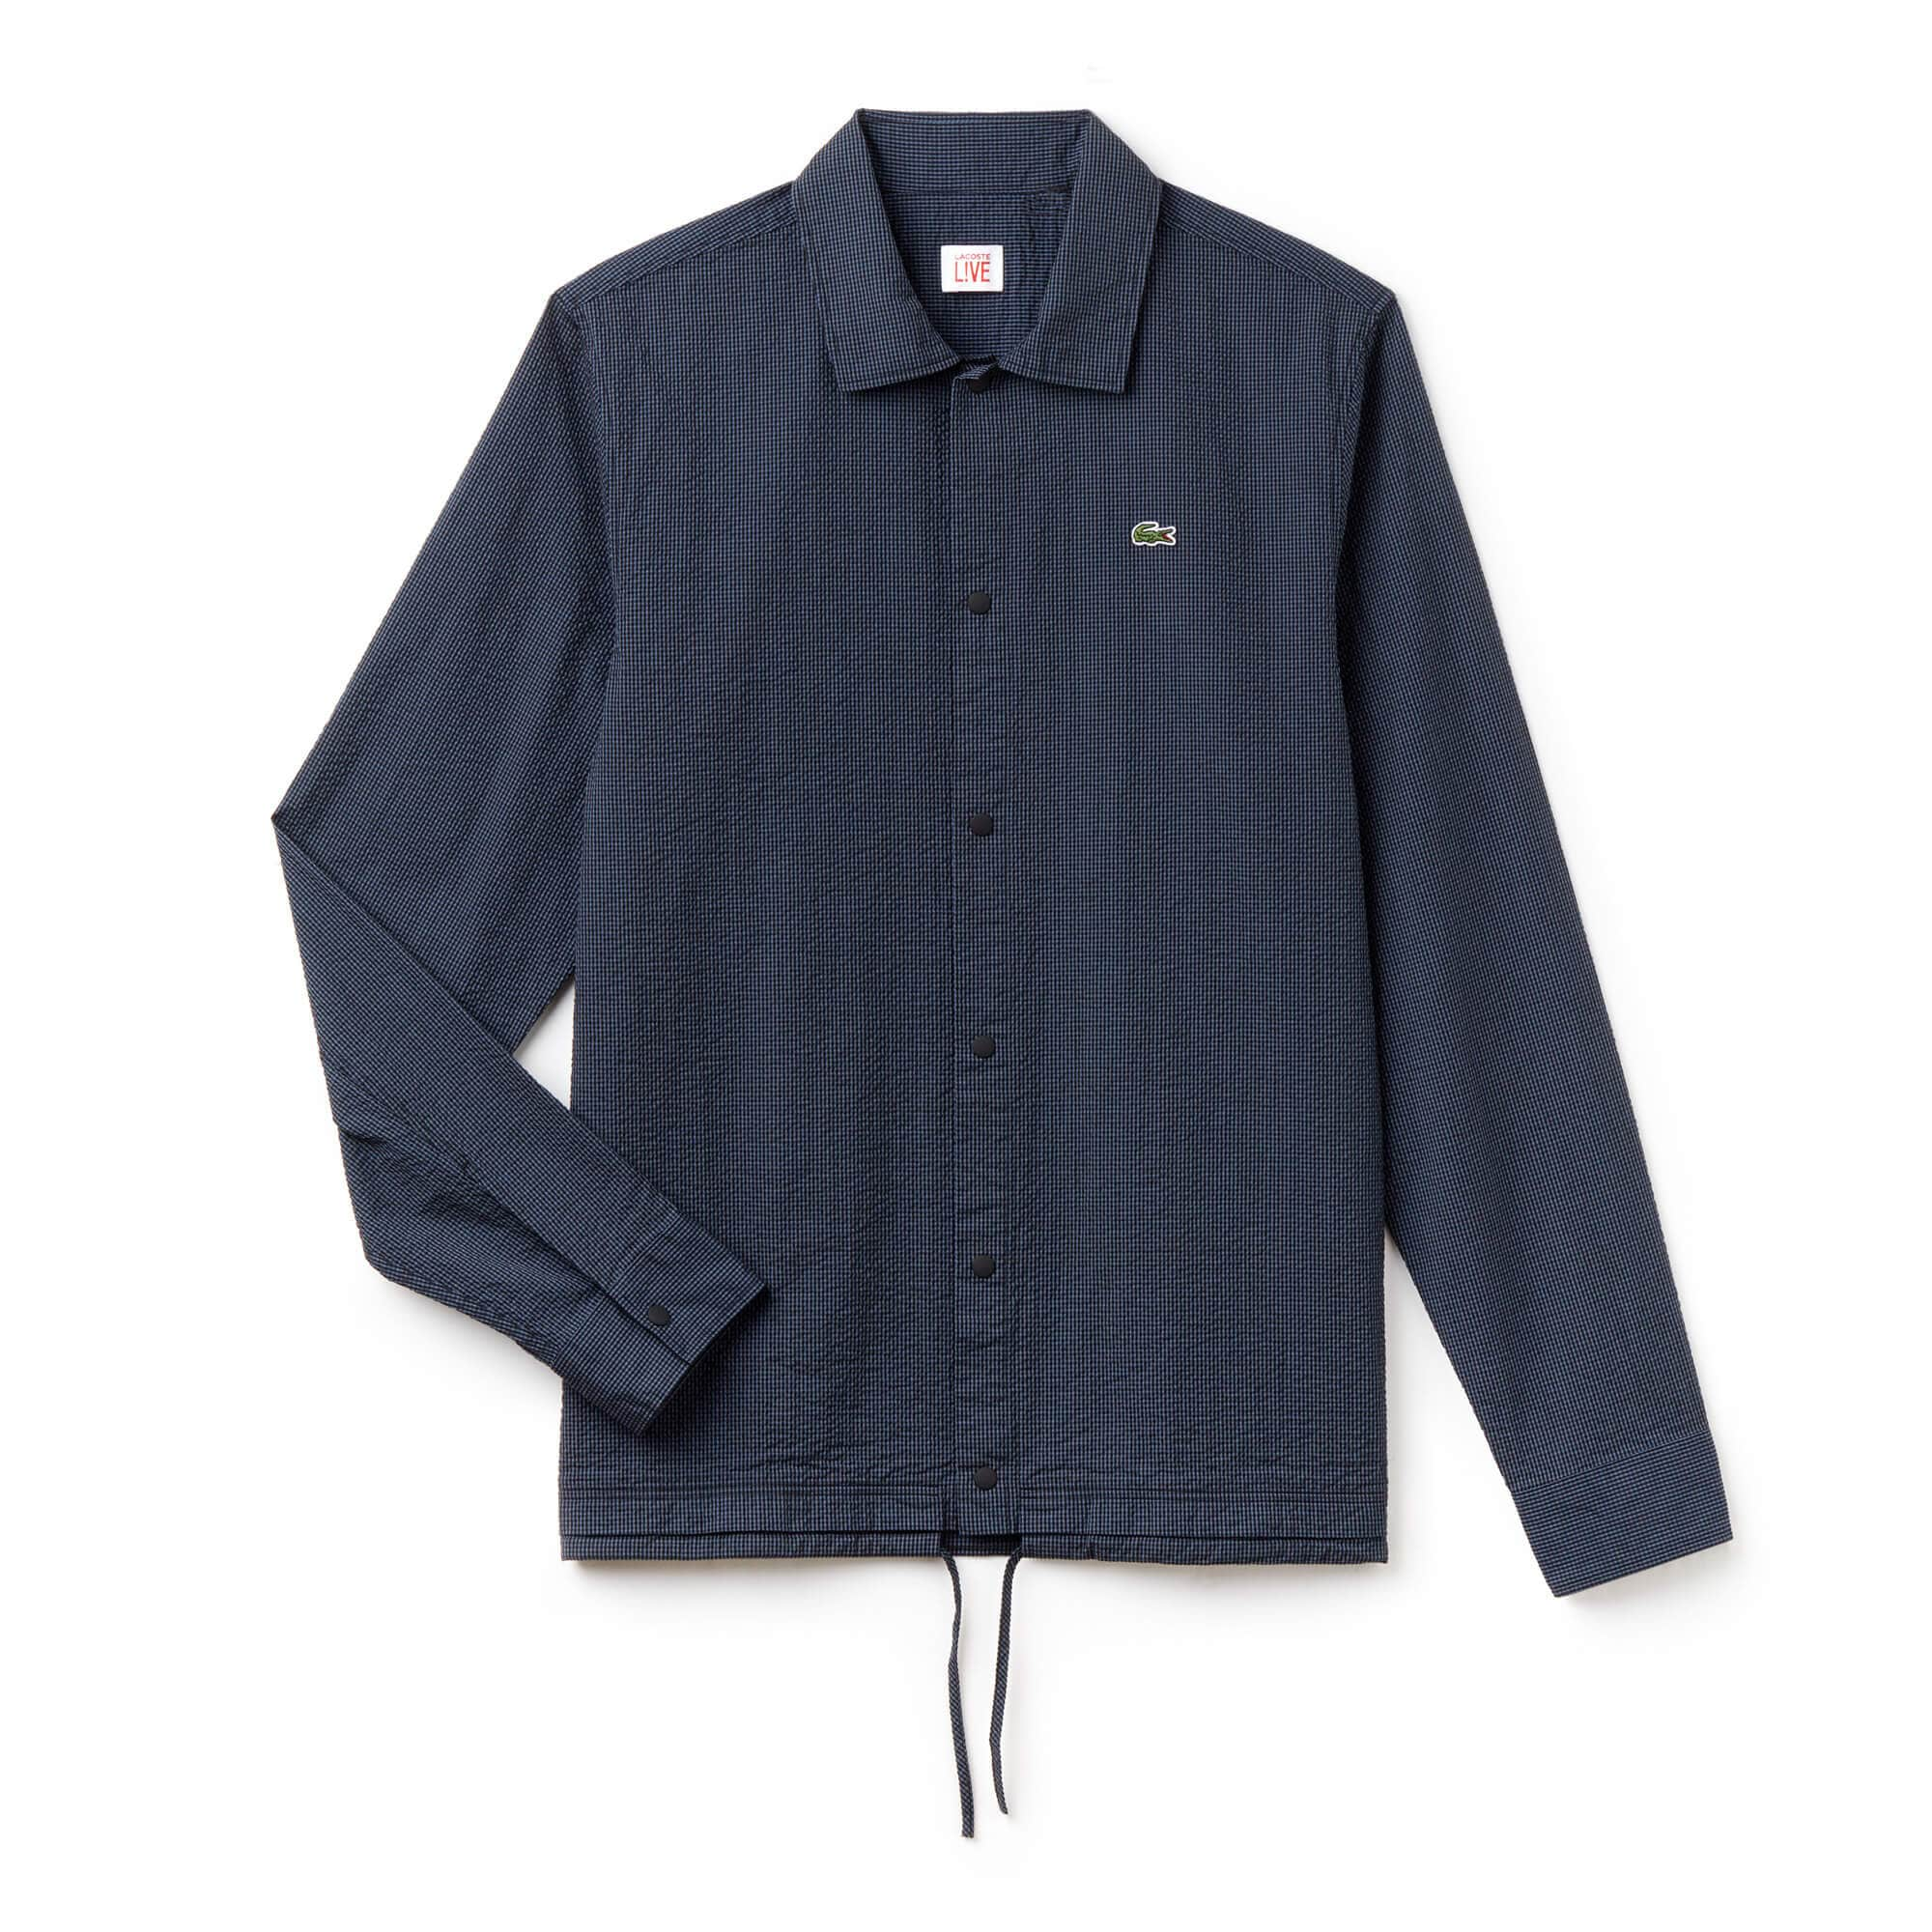 Skinny Fit Herren-Hemd aus Seersucker mit Vichy-Muster LACOSTE L!VE